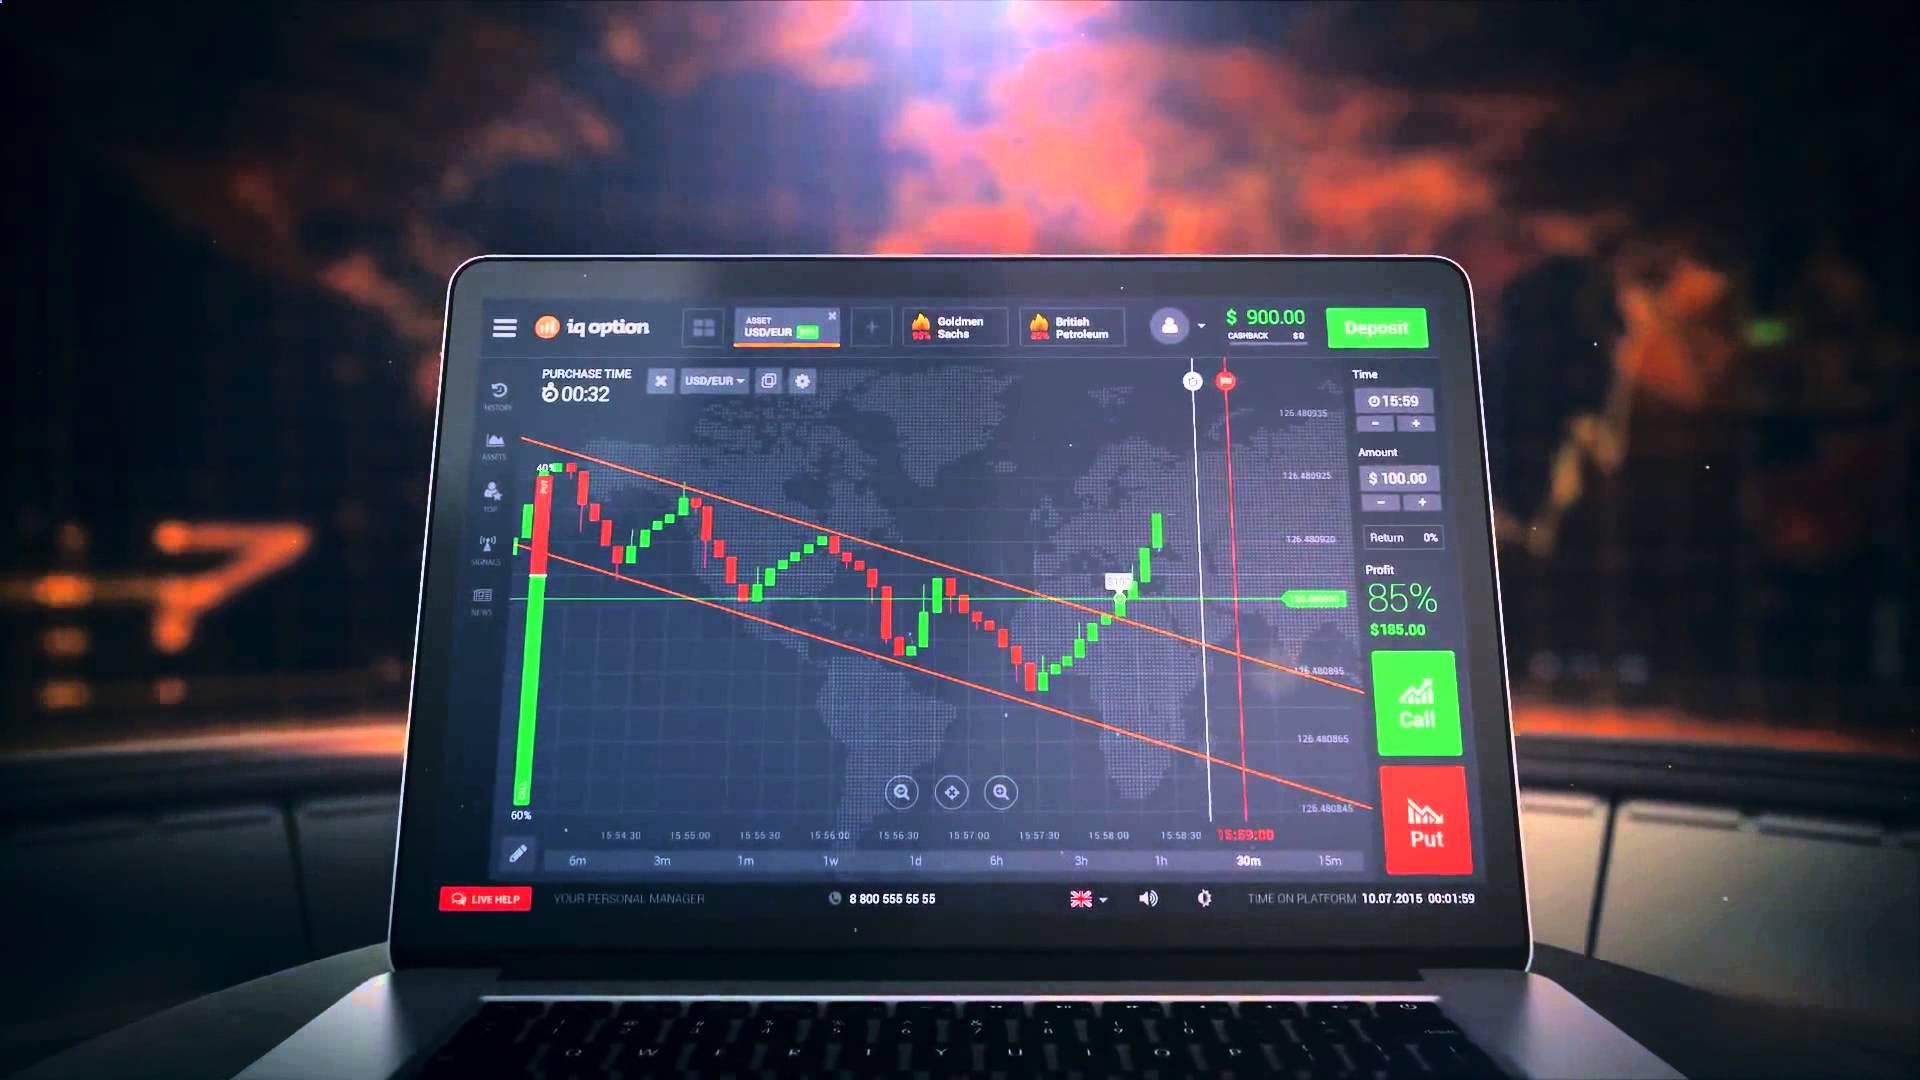 Trade Binary Options on Iq Option